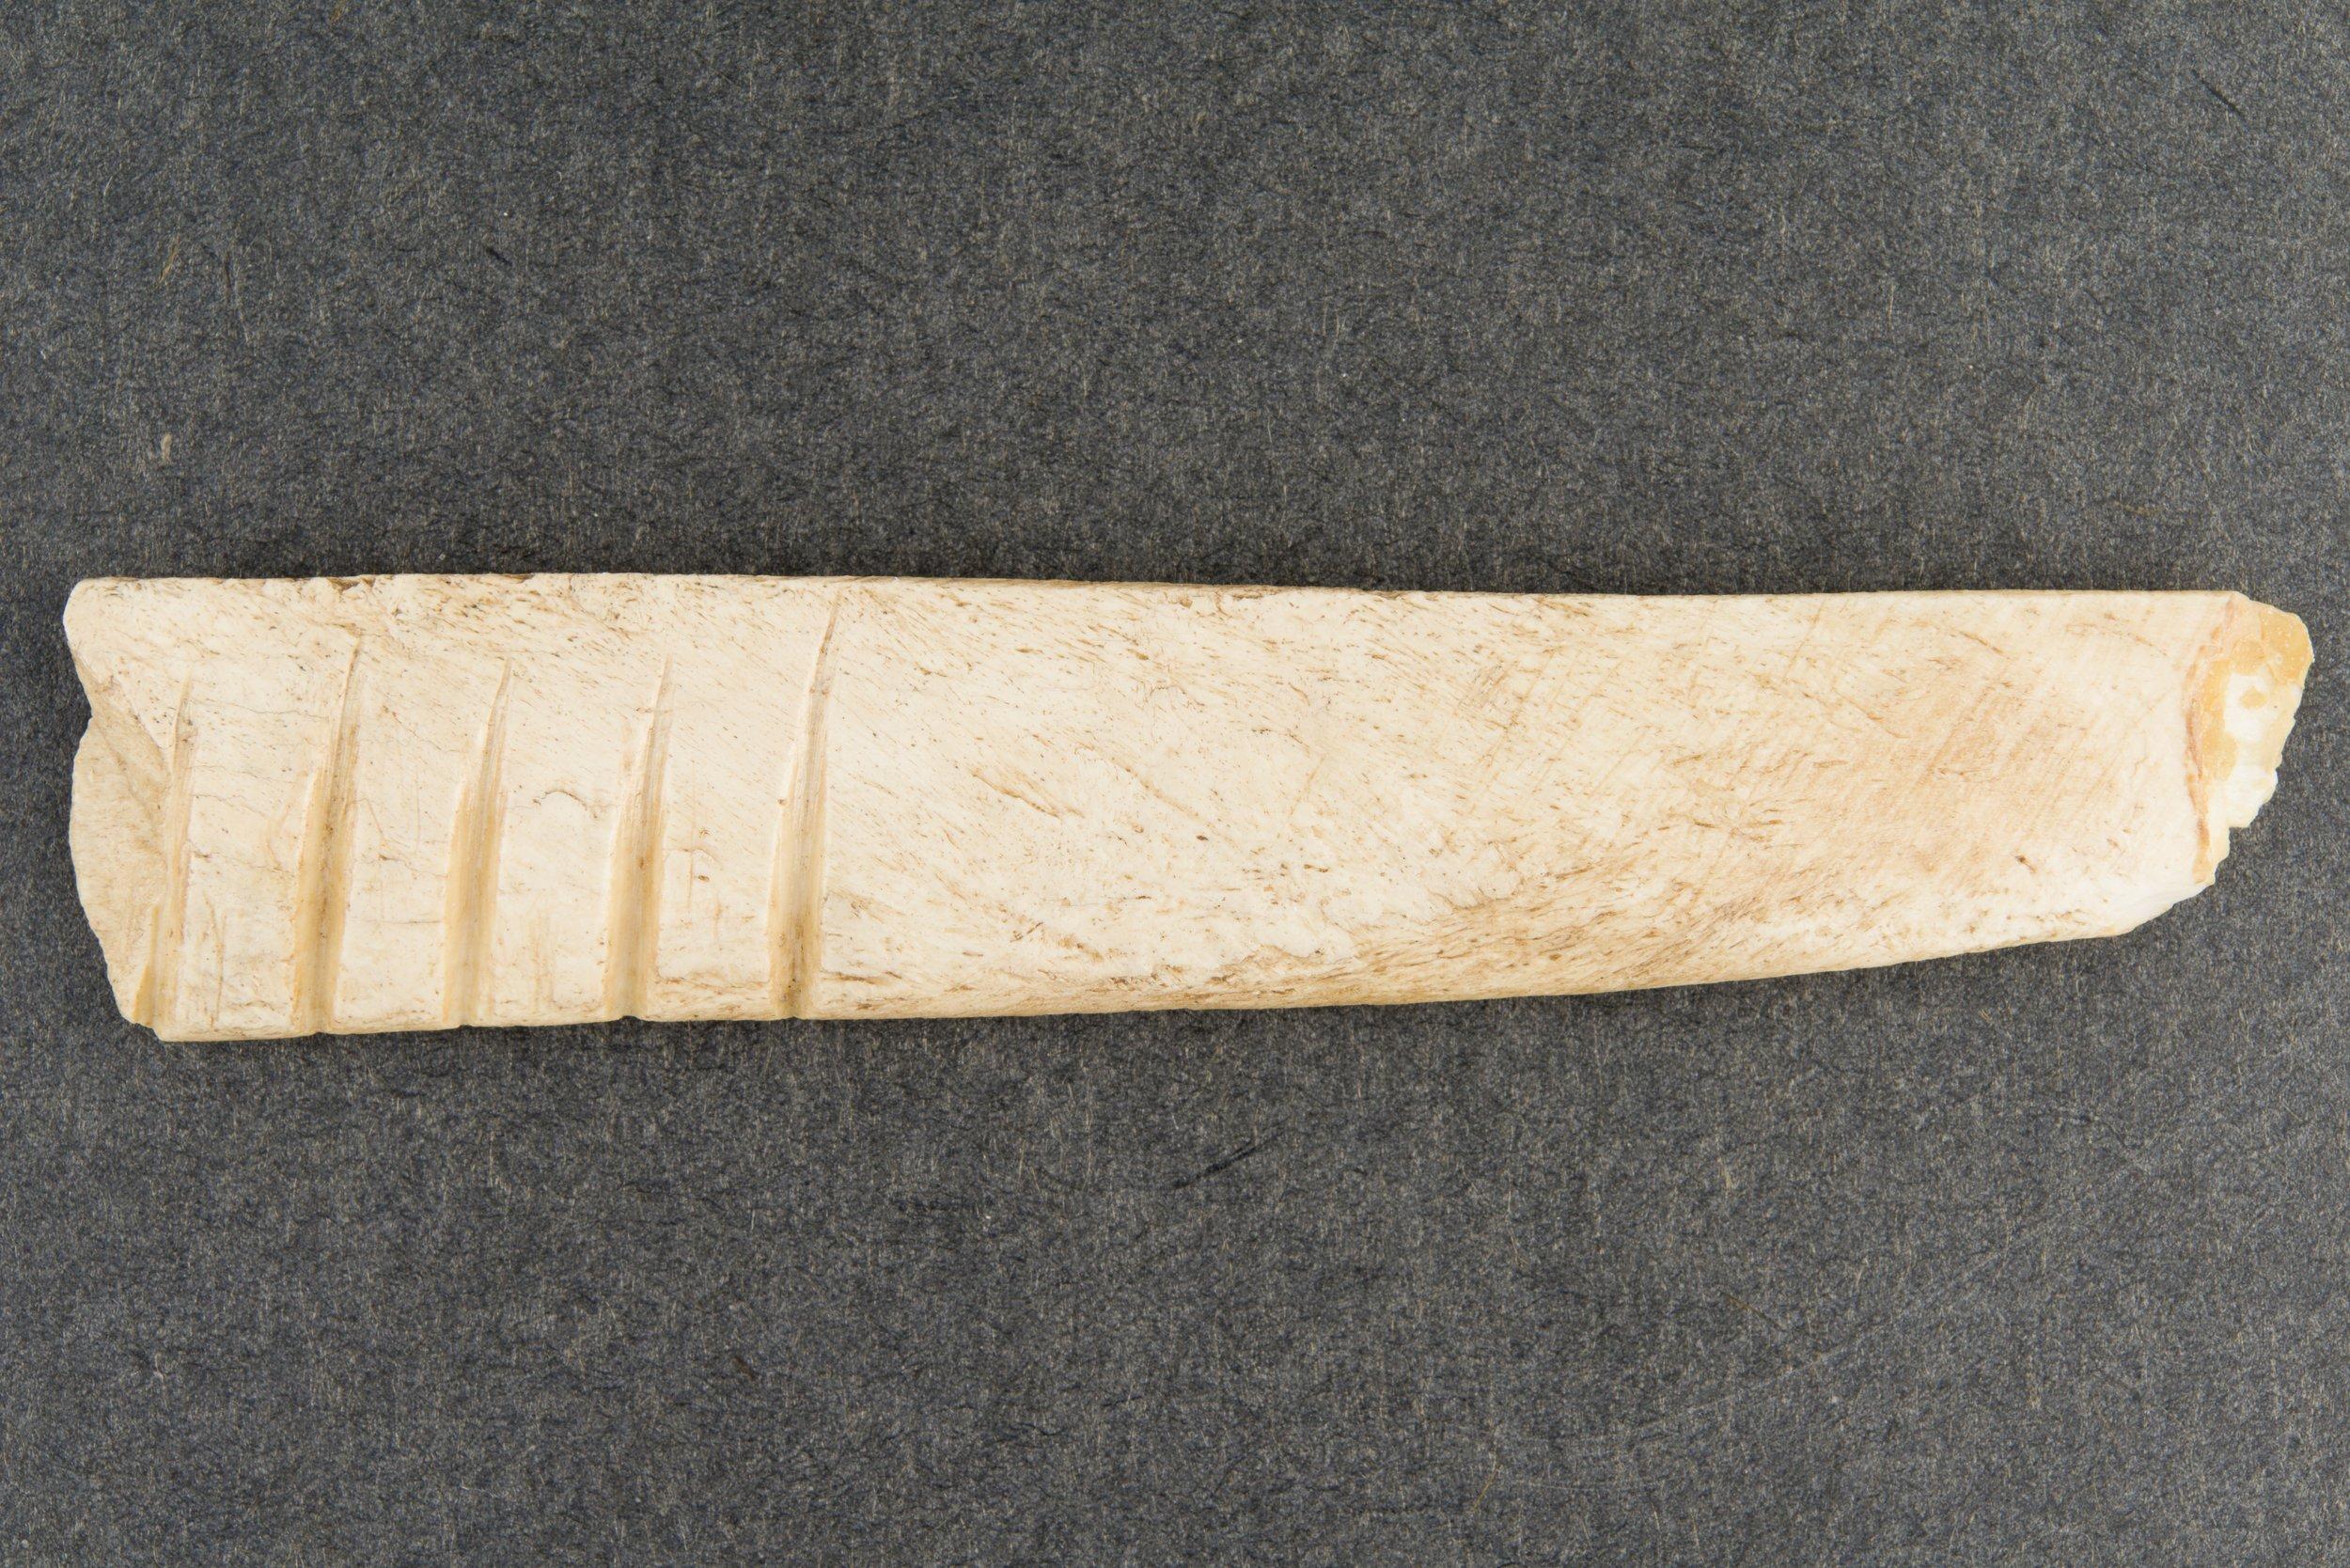 Bone Rasp from the Saxman Site, 14RC301 - 3